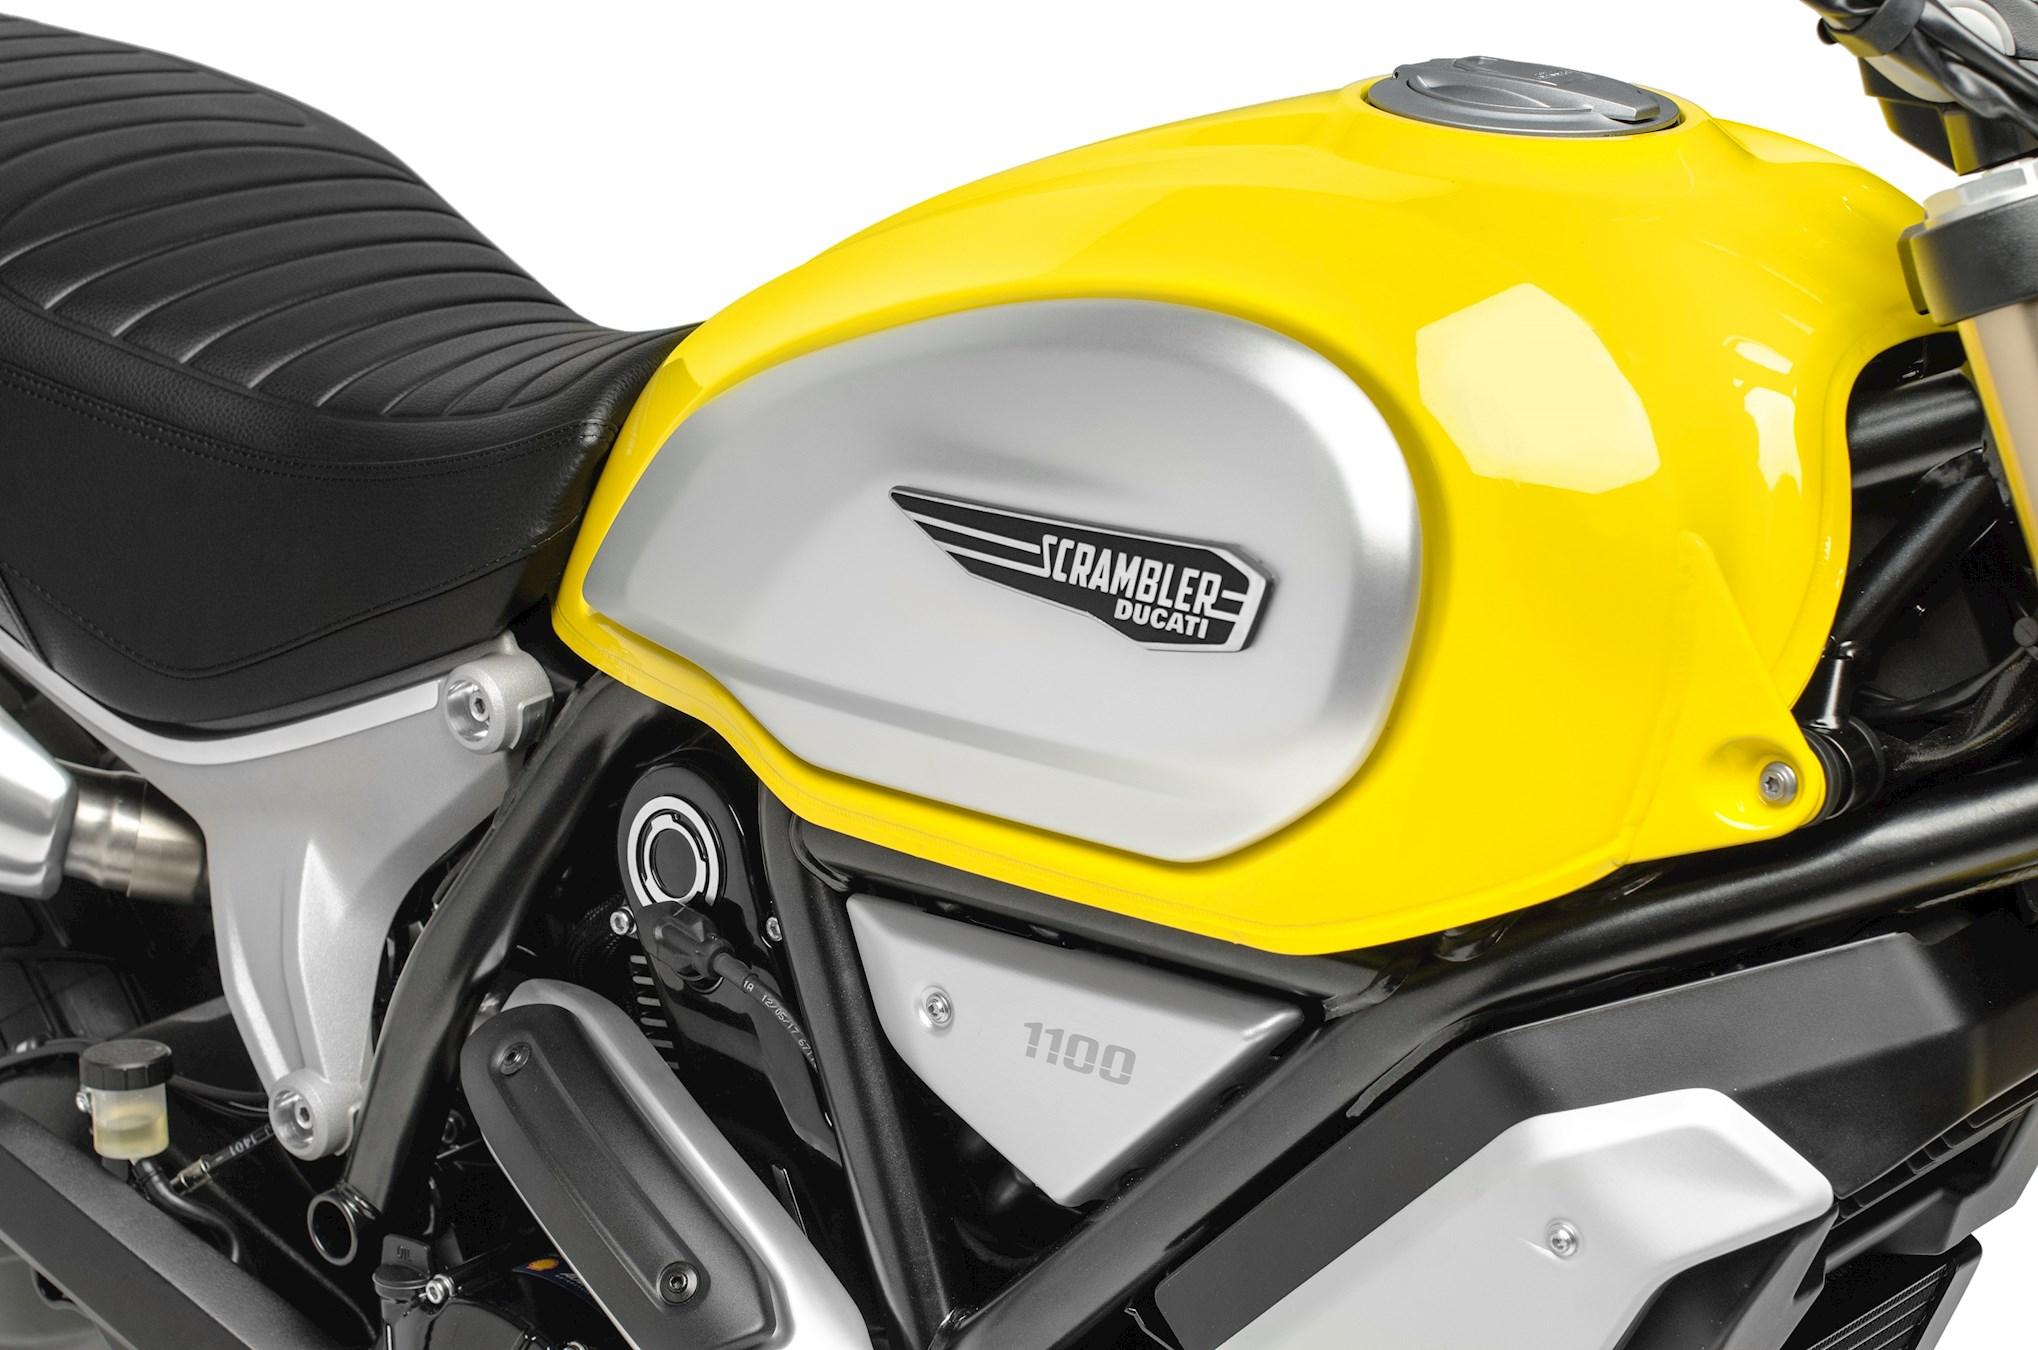 МОТОЦИКЛ DUCATI SCRAMBLER 1100 ― Артмото - купить квадроцикл в украине и харькове, мотоцикл, снегоход, скутер, мопед, электромобиль